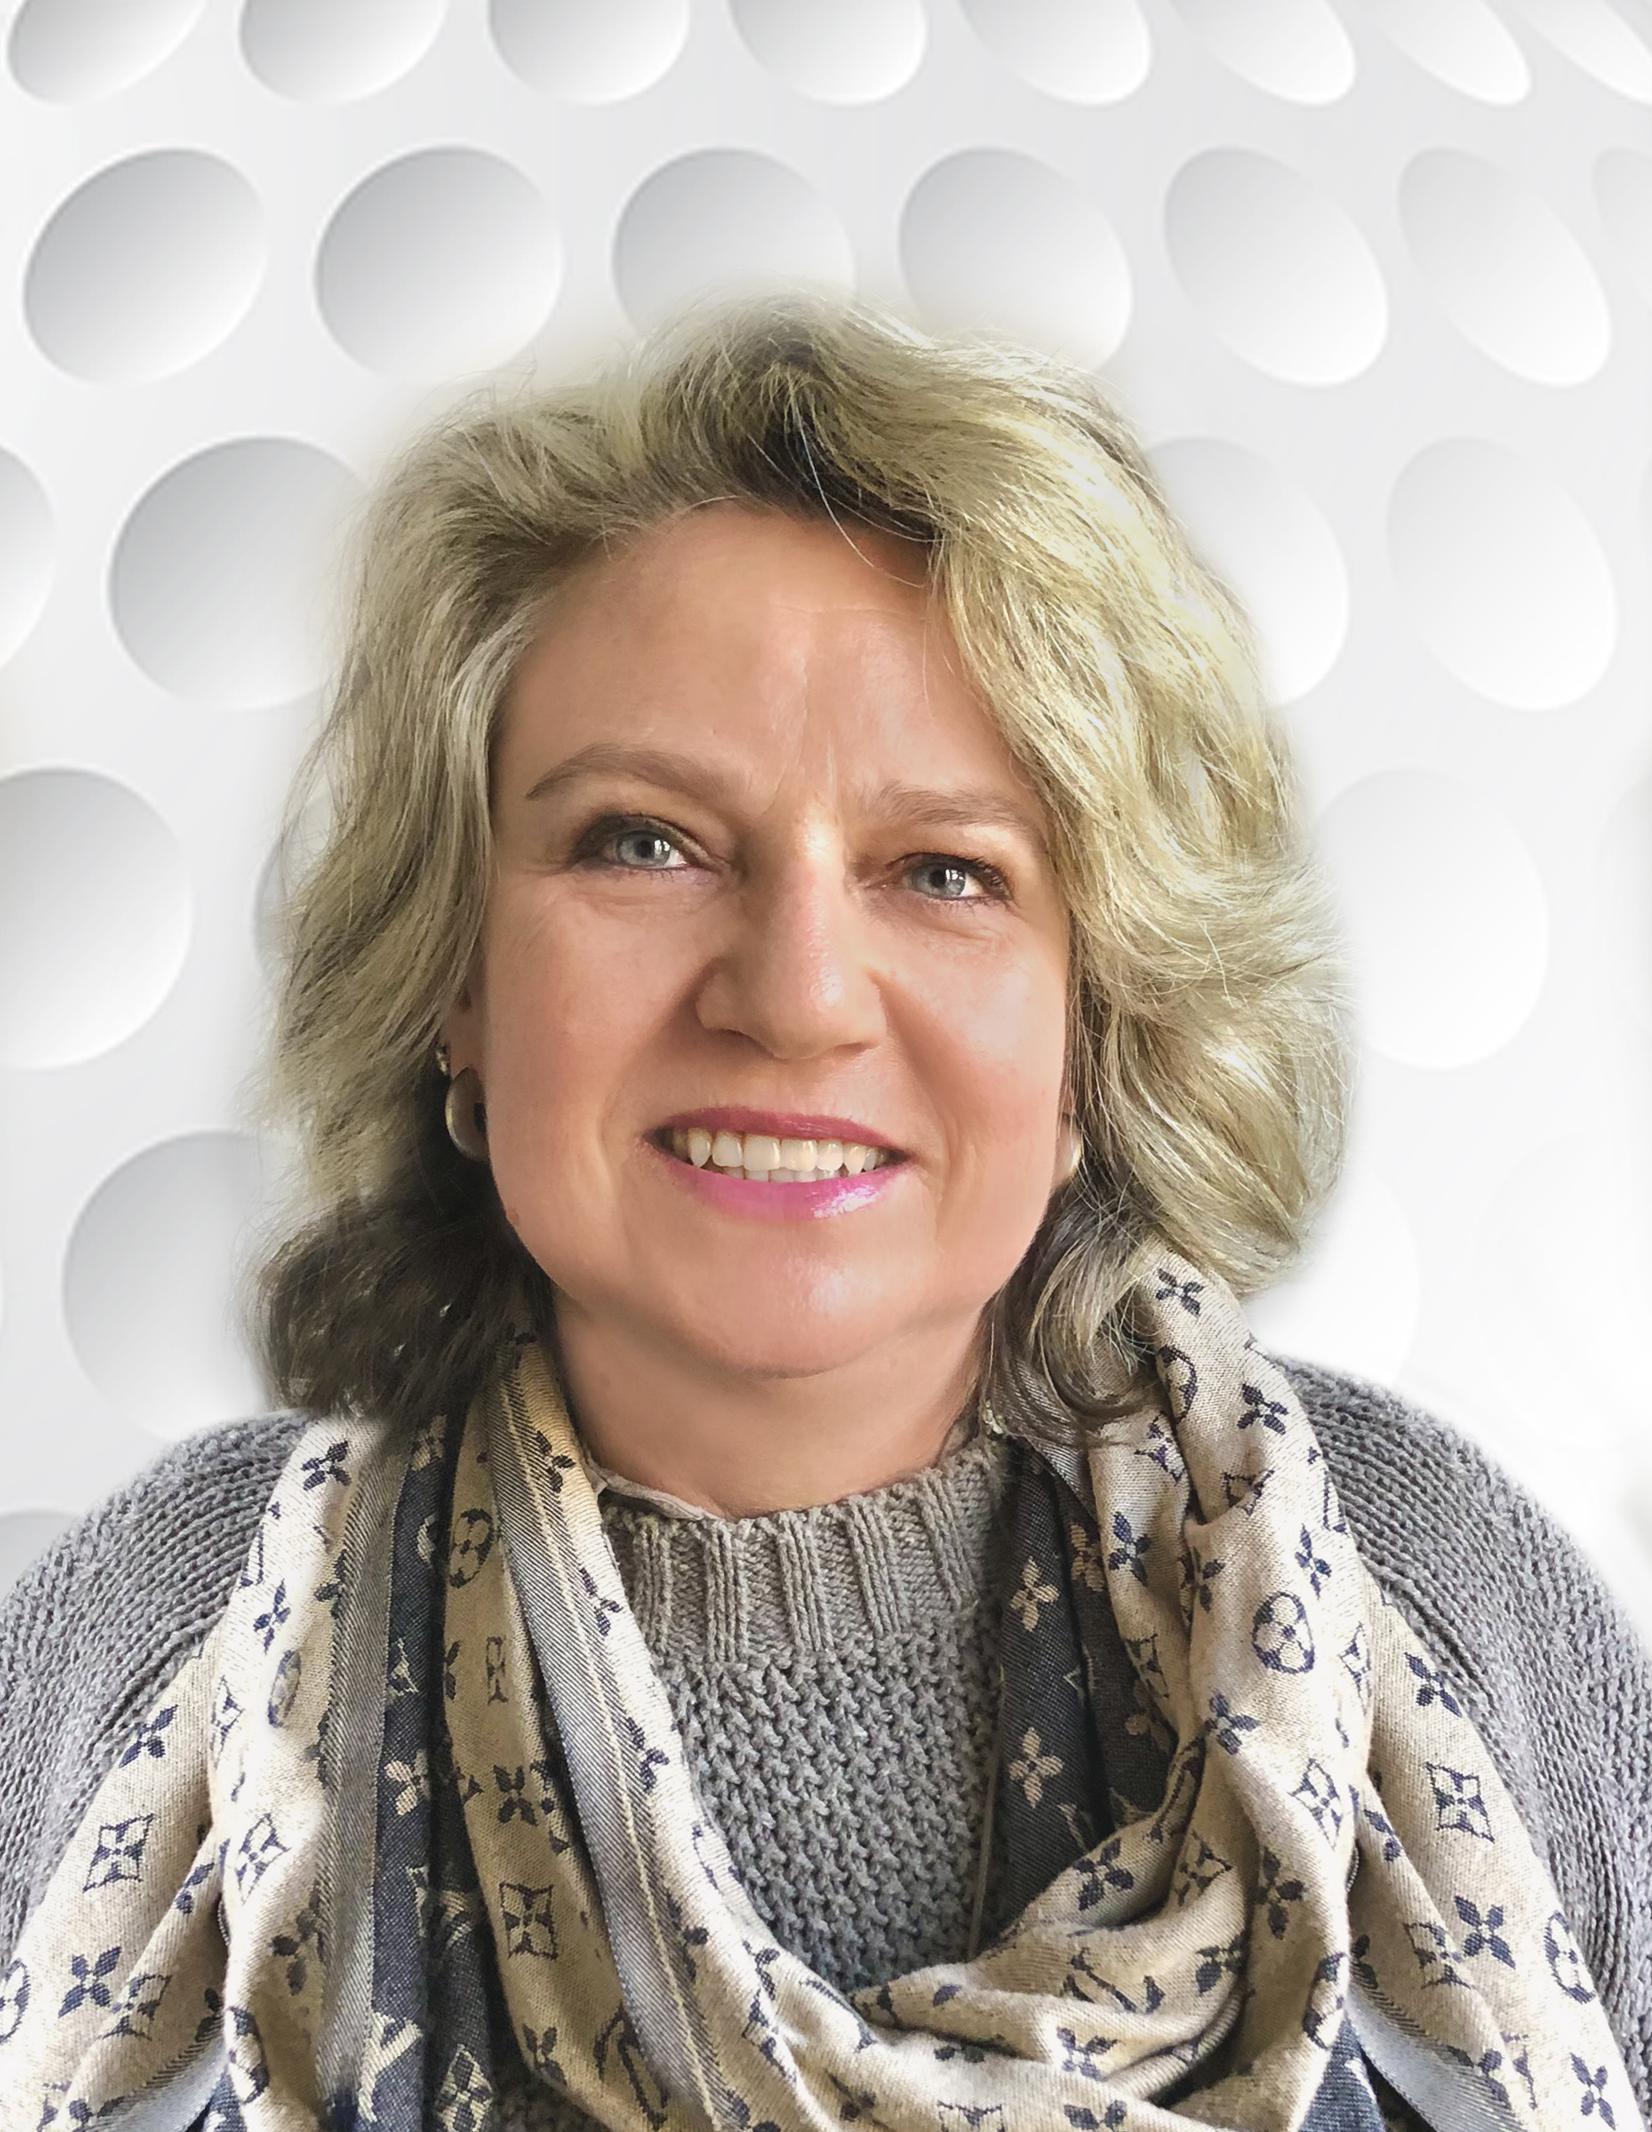 Simone Krejza